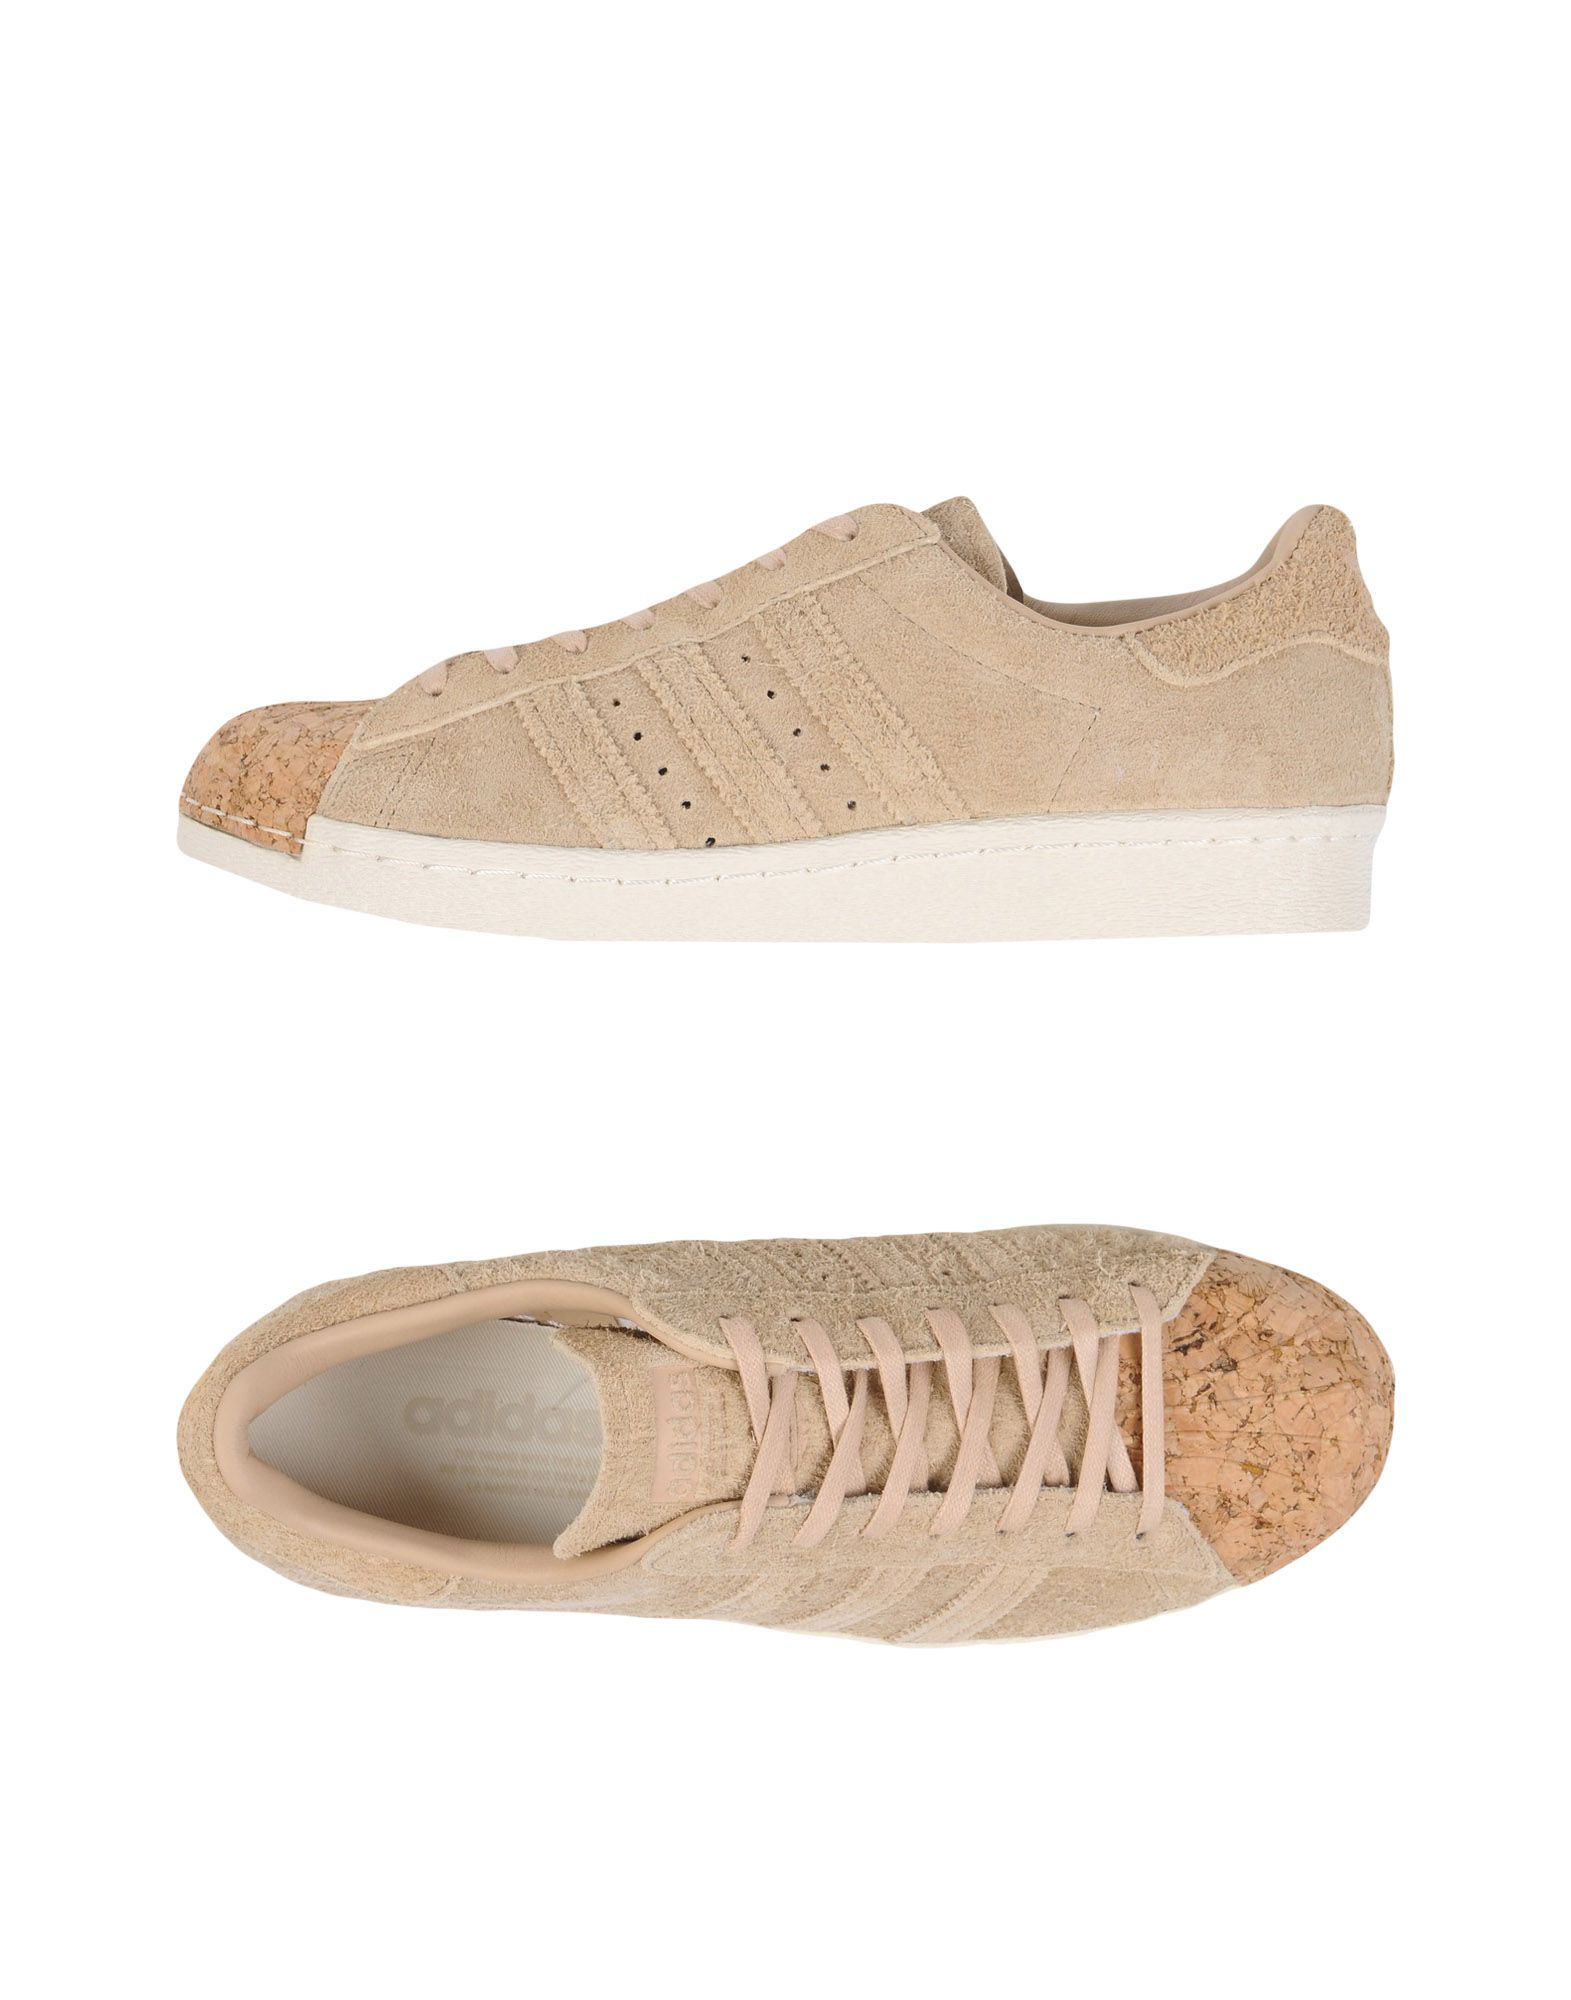 ADIDAS ORIGINALS Низкие кеды и кроссовки adidas originals superstar i basketball shoe infant toddler